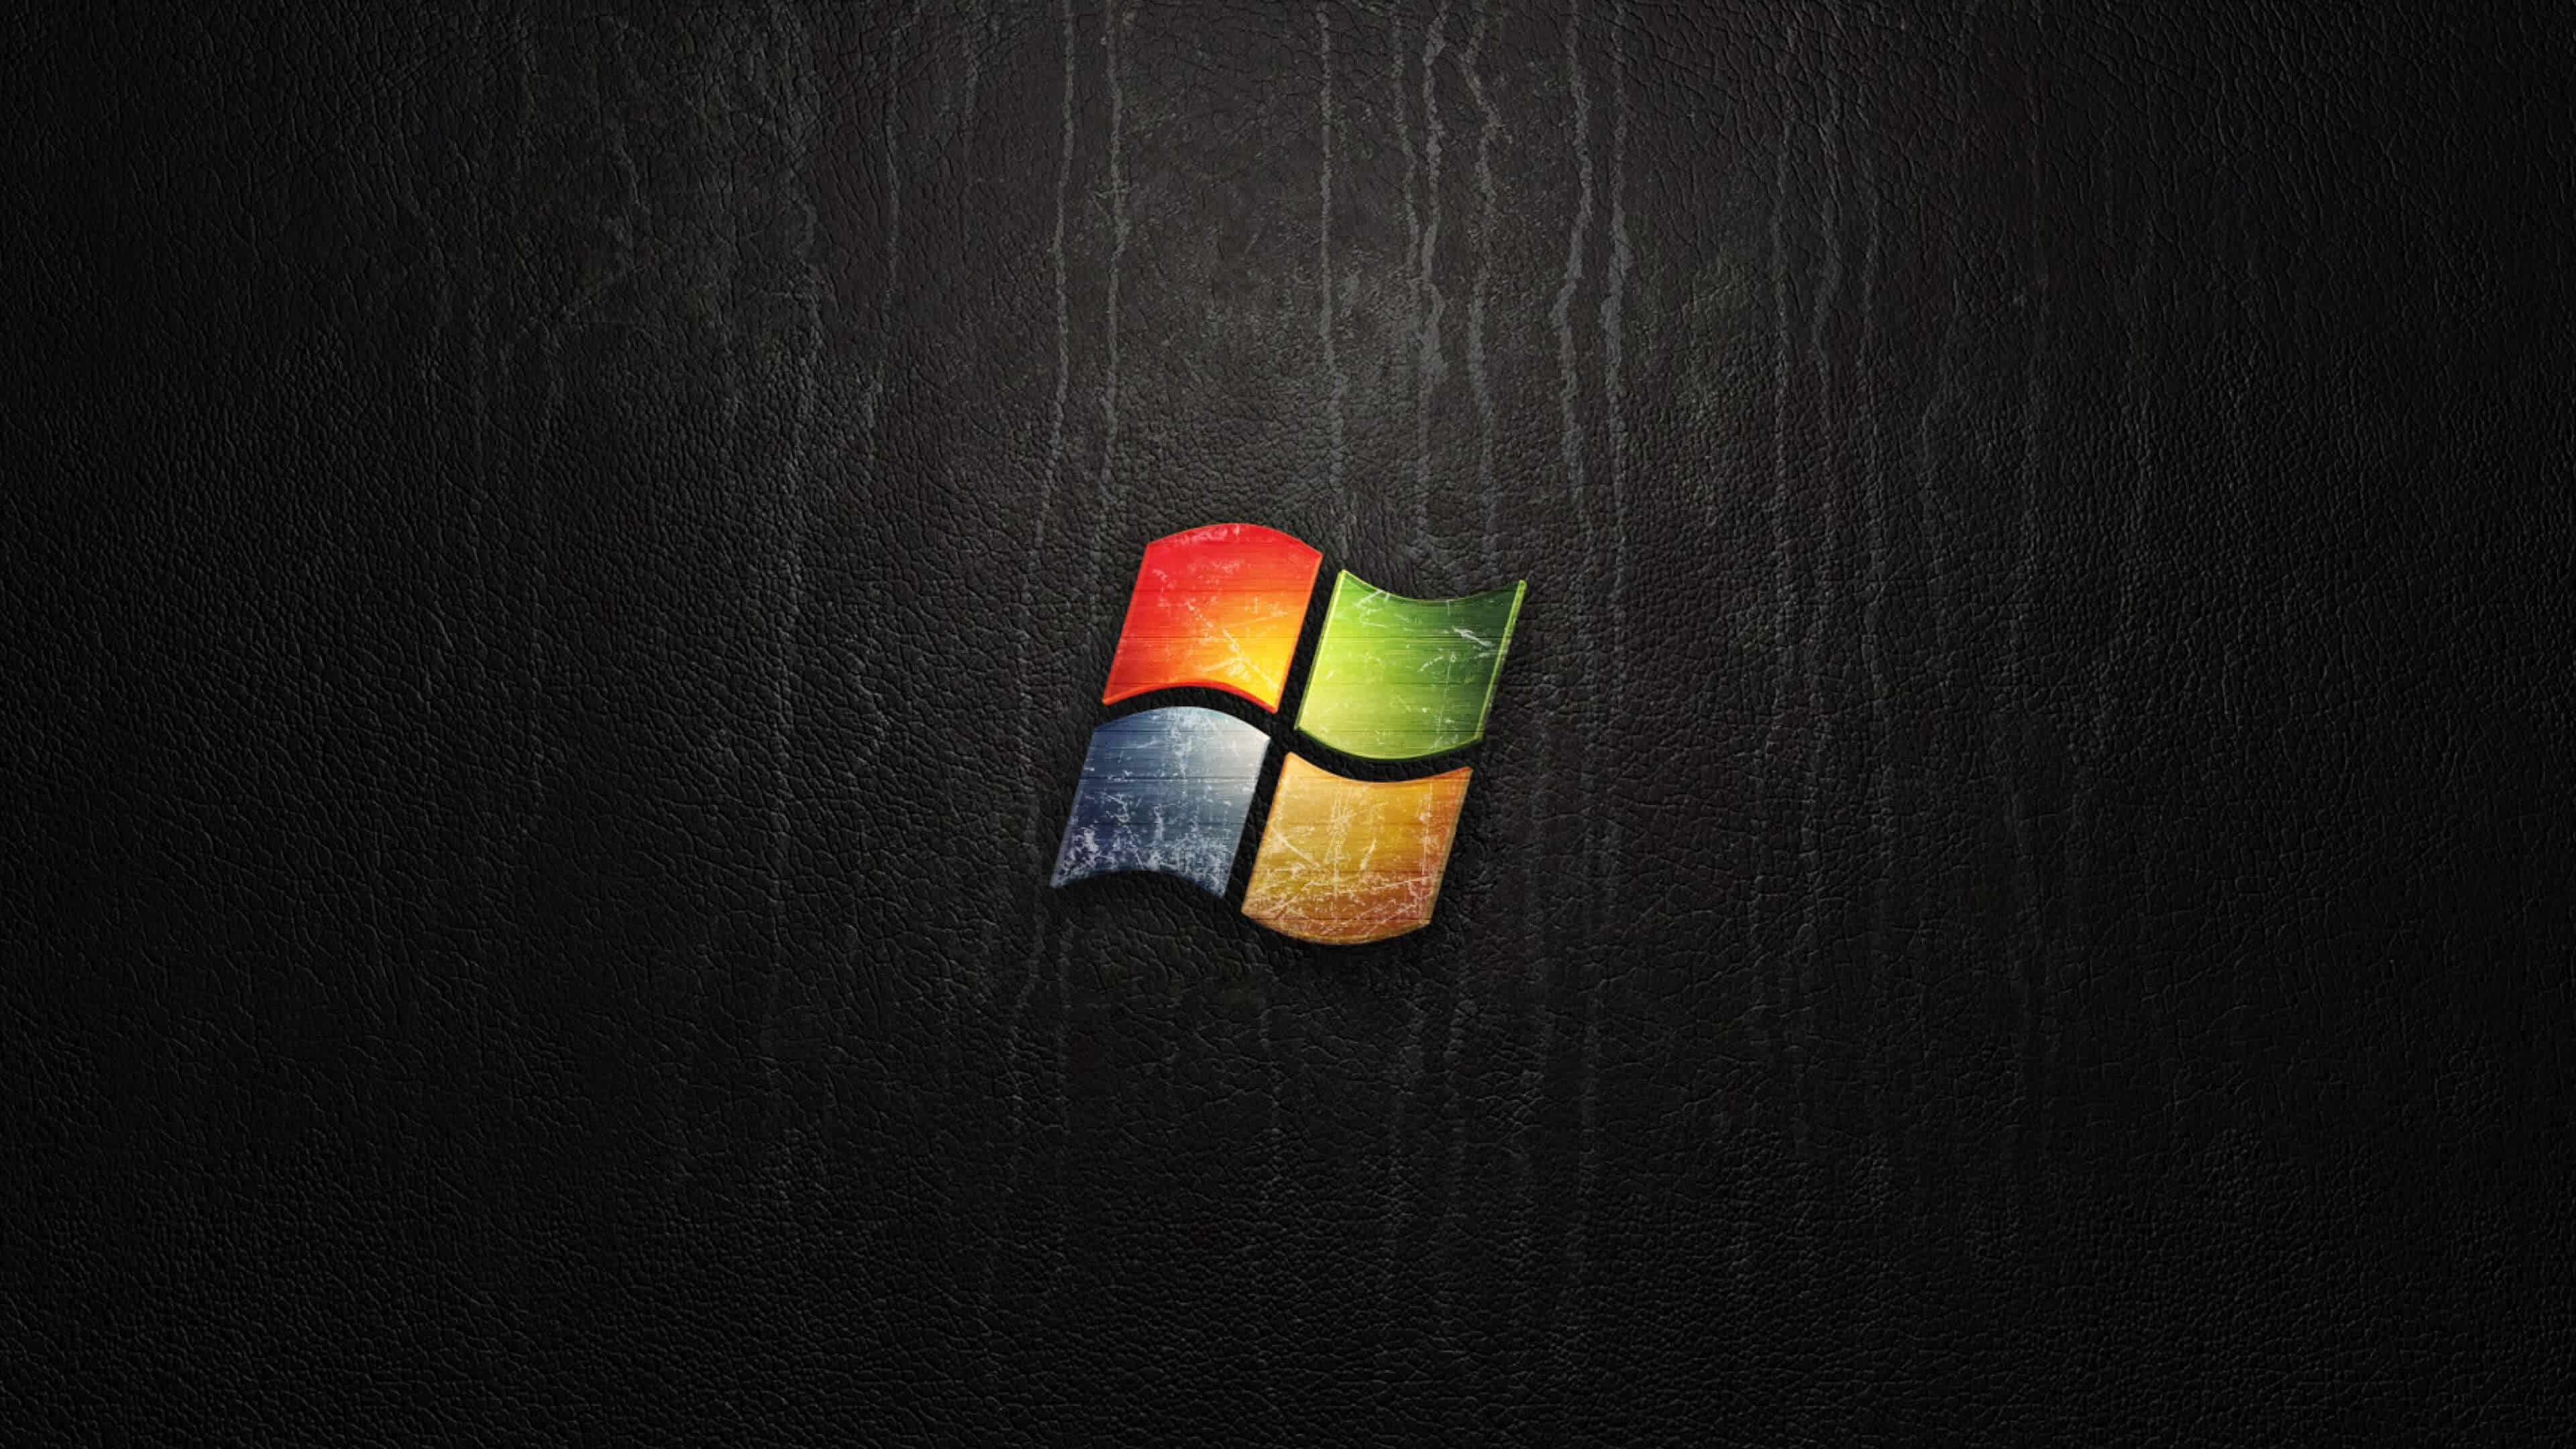 wallpaper for microsoft